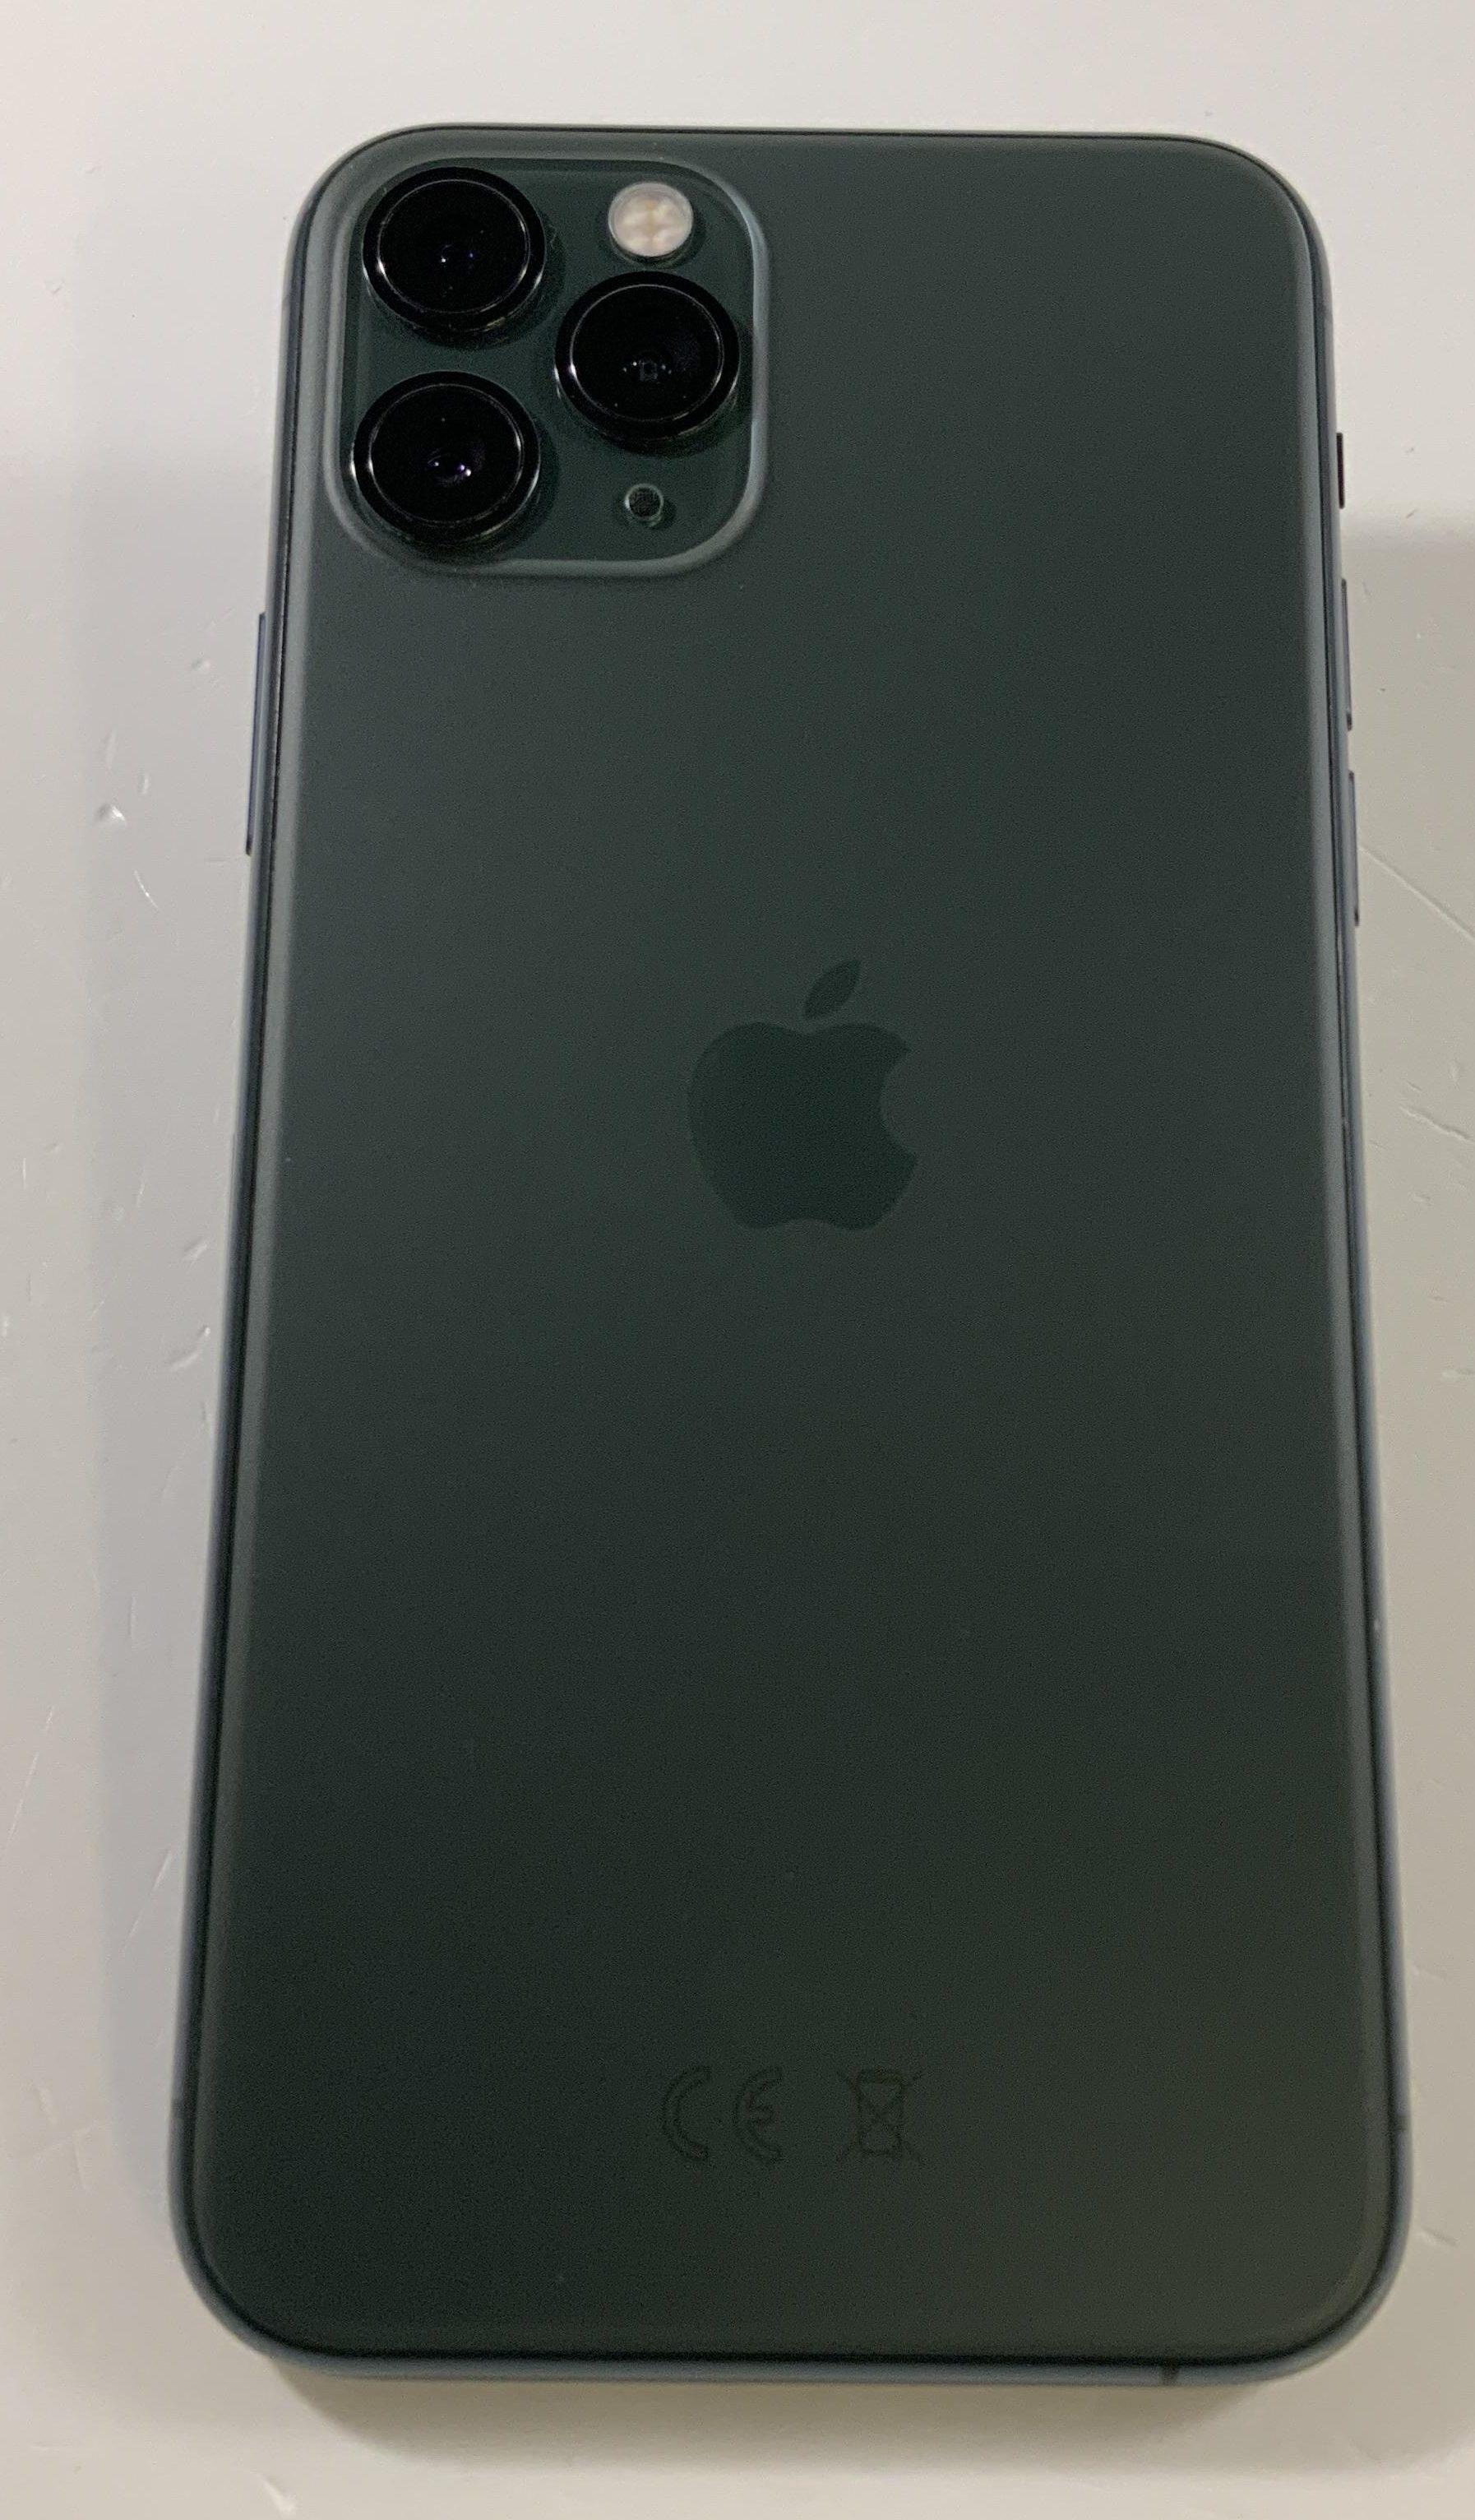 iPhone 11 Pro 512GB, 512GB, Midnight Green, Afbeelding 2